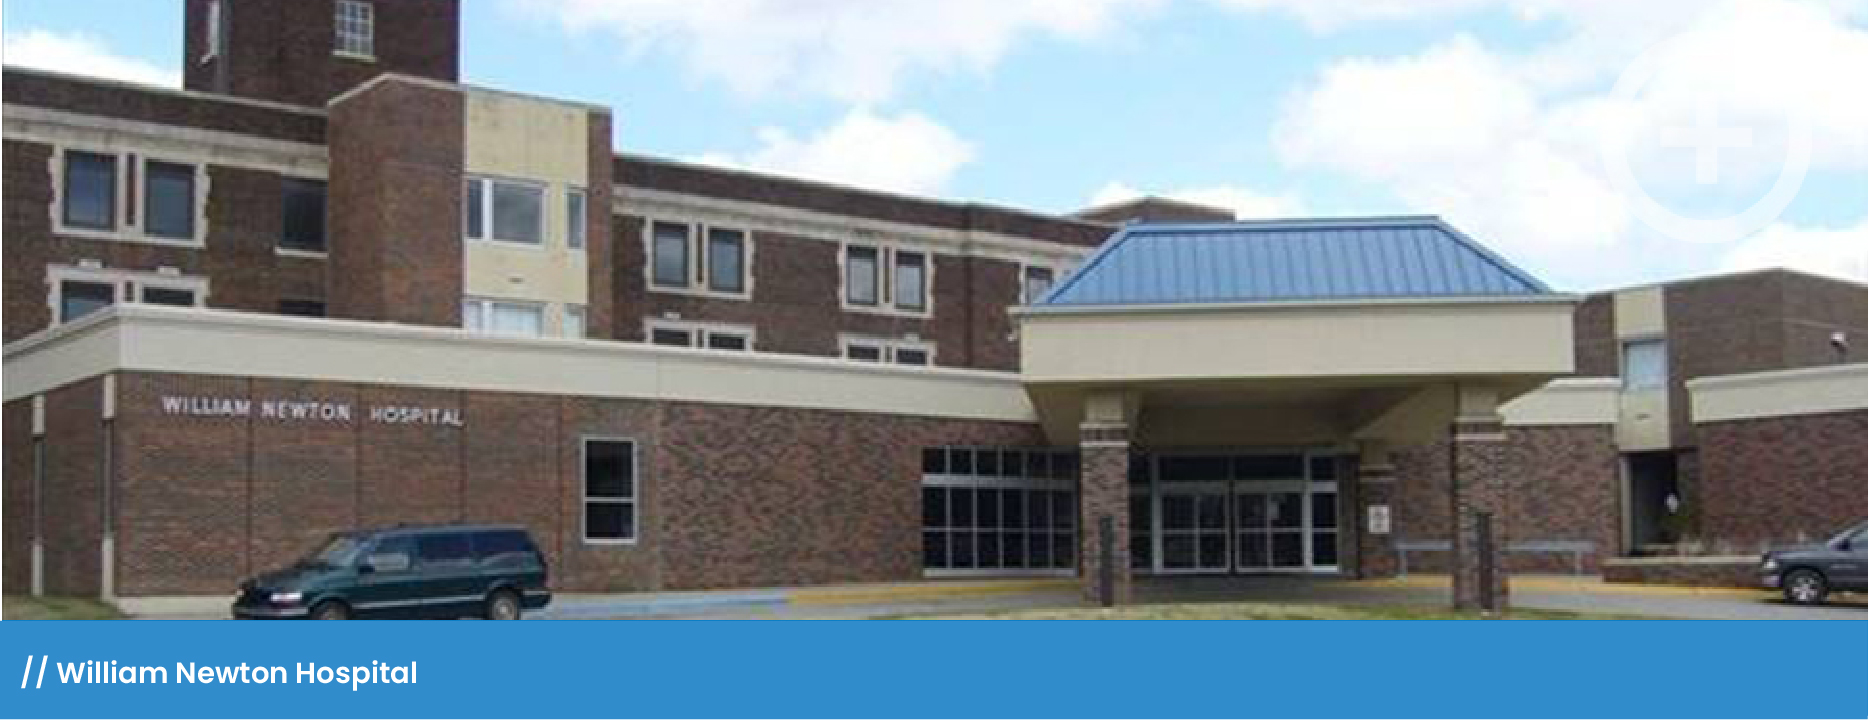 Yanik-Watermark_William Newton Hospital-